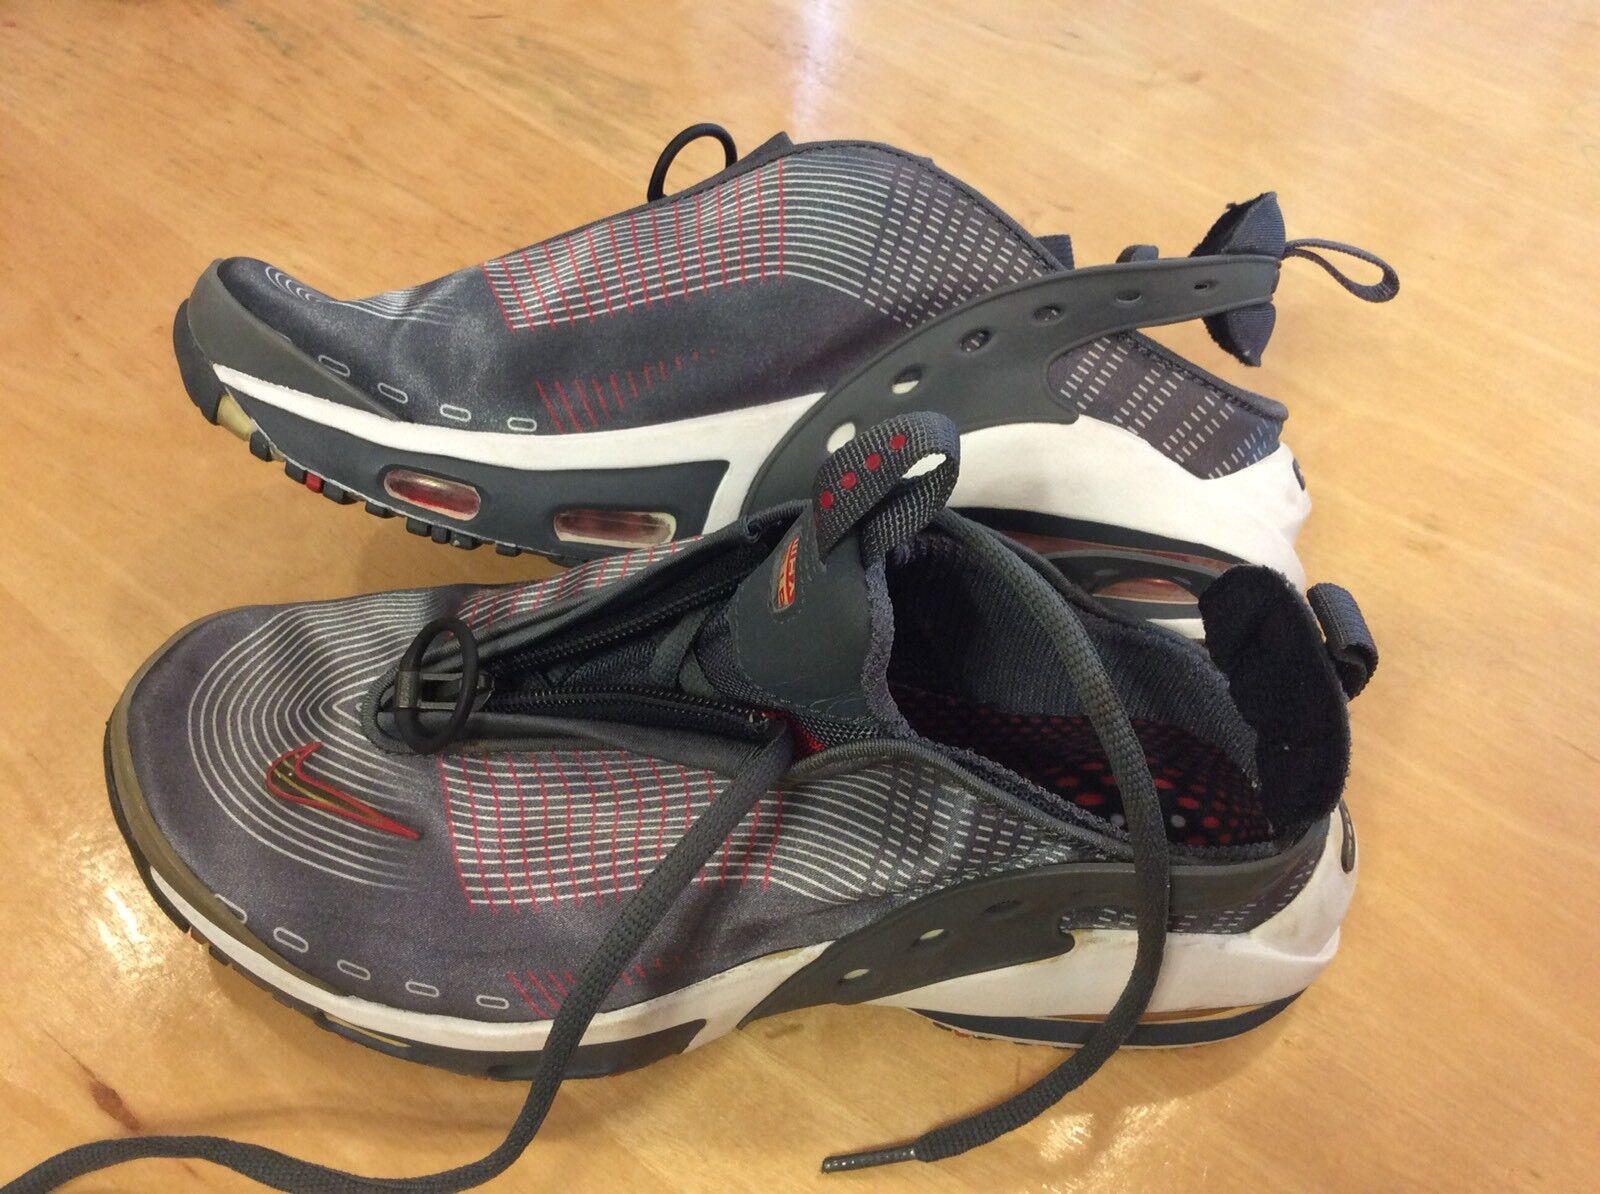 VINTAGE 2000 Women's Nike Air Max Presto Craze Athletic shoes SZ 7.5 NWOB